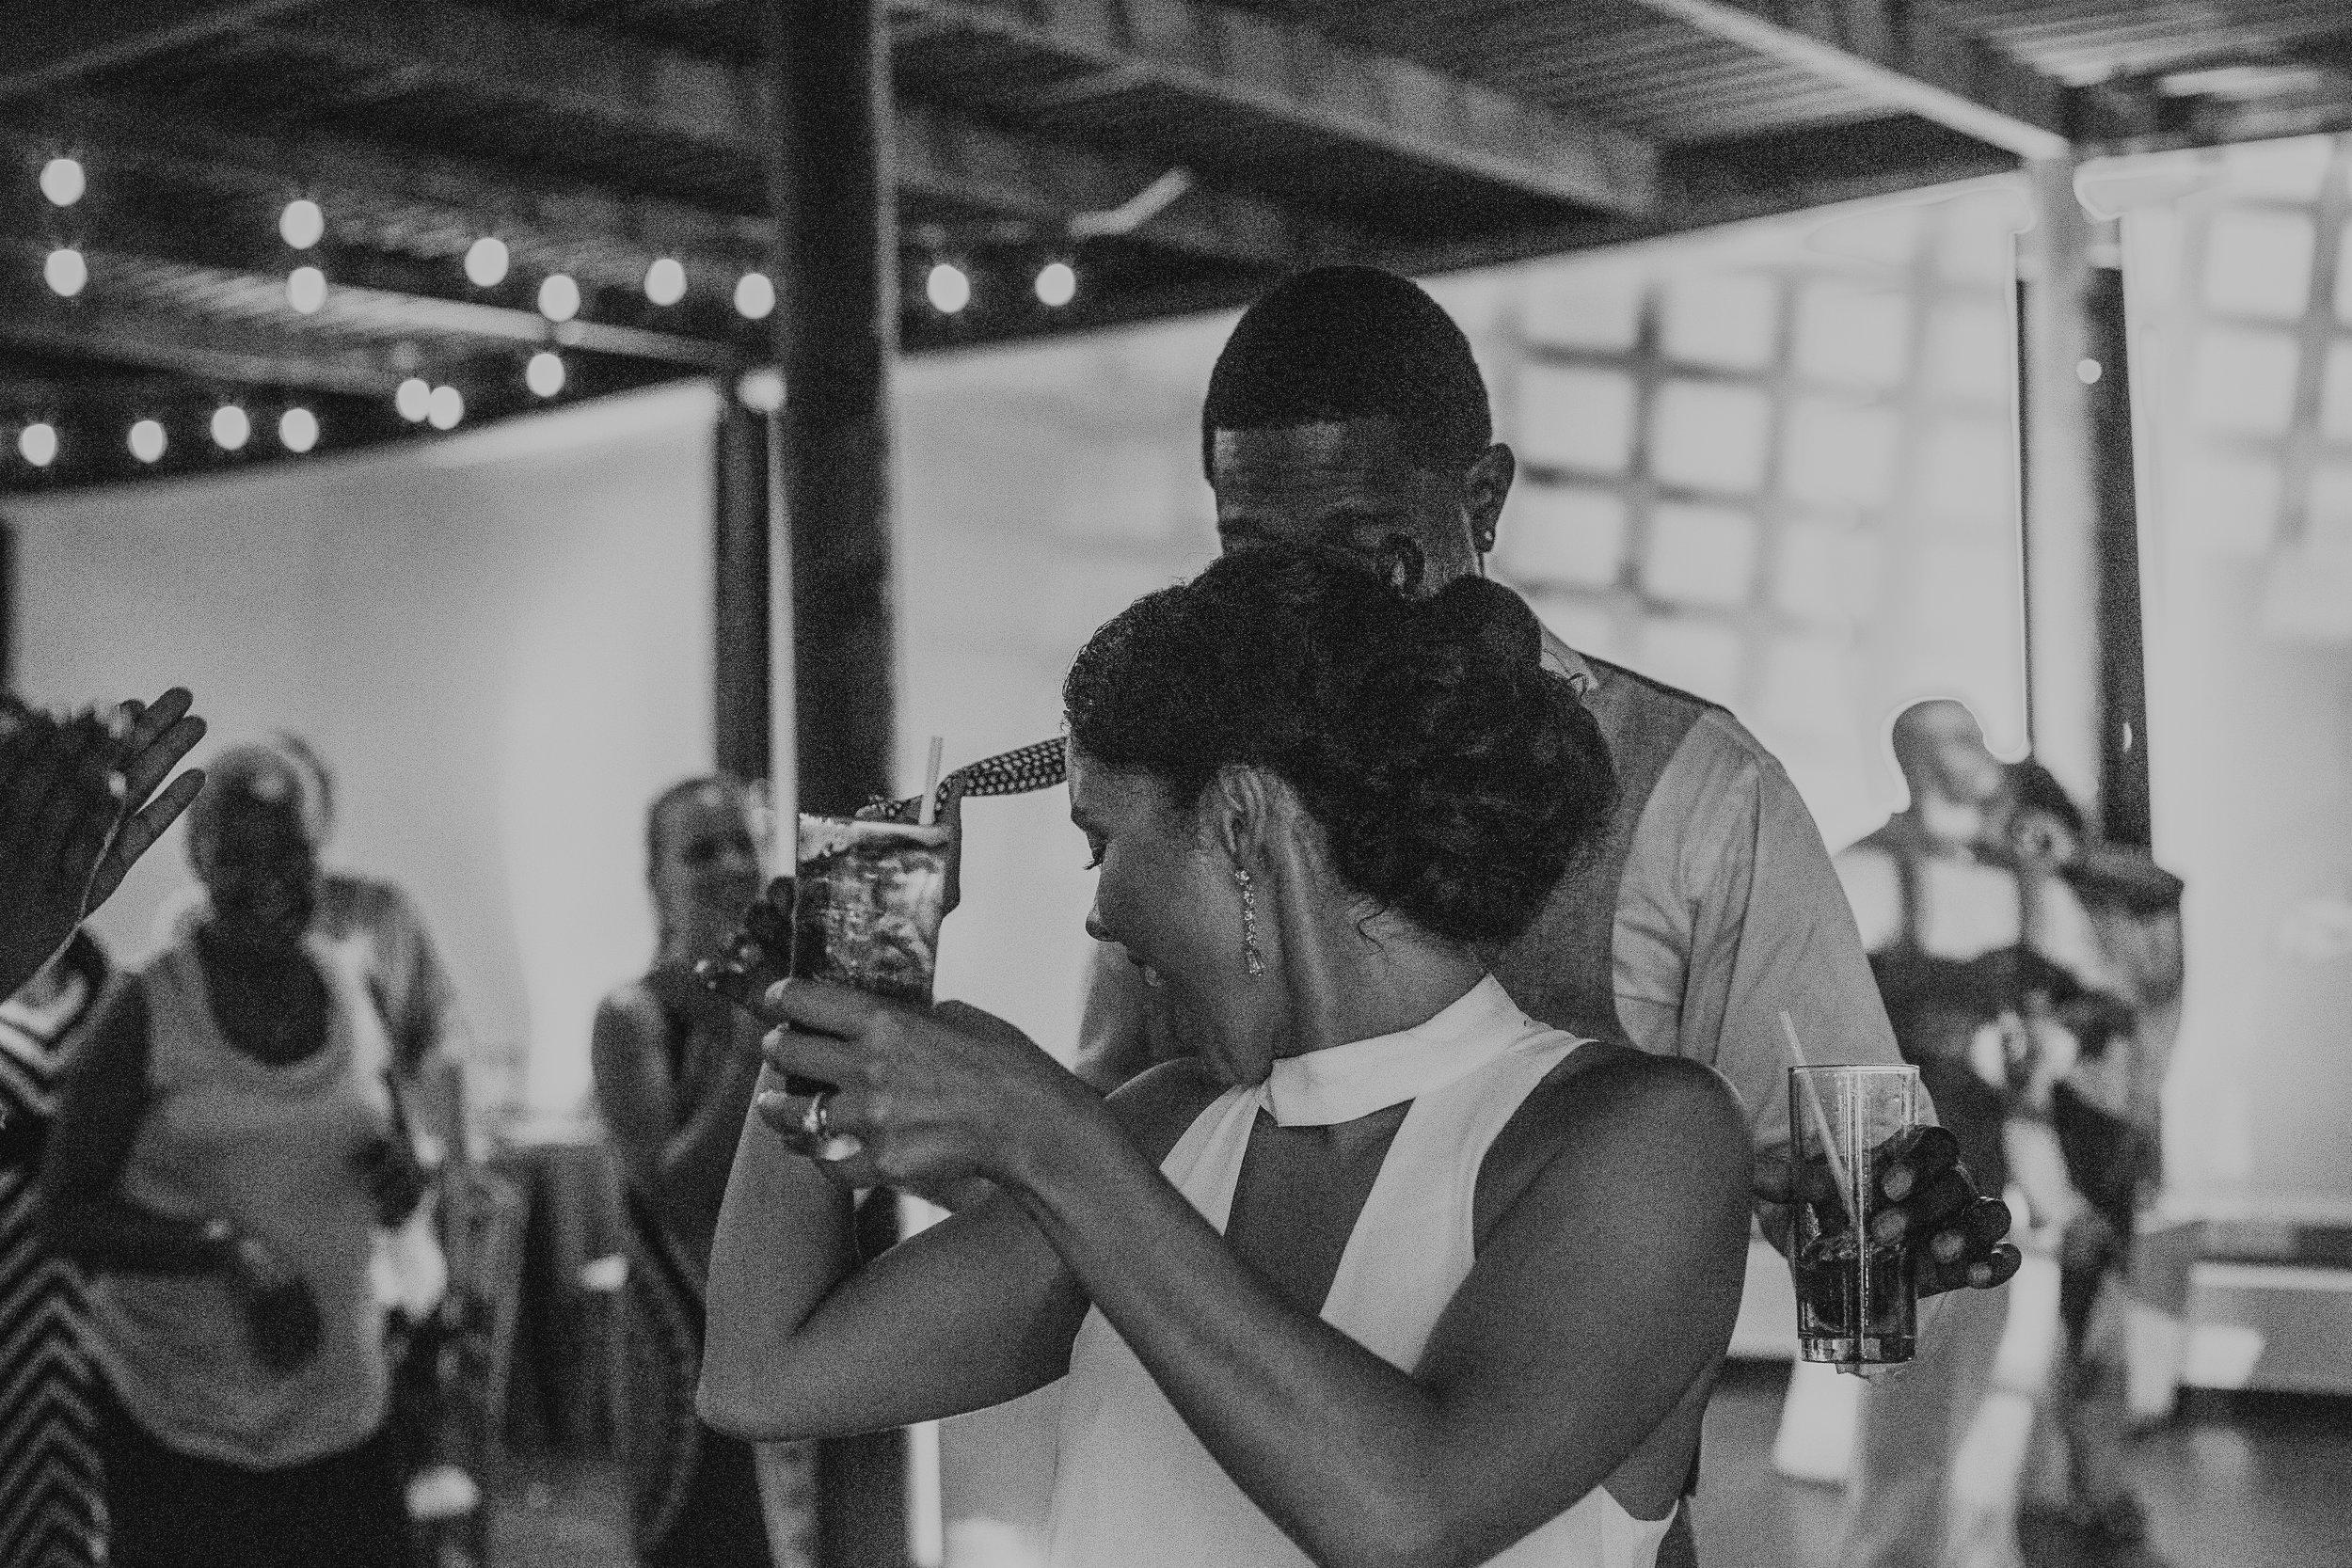 Destination-Wedding-Photographer-cleveland-wedding-photographer-elopement-photographer-tulum-photographer-mexico-wedding